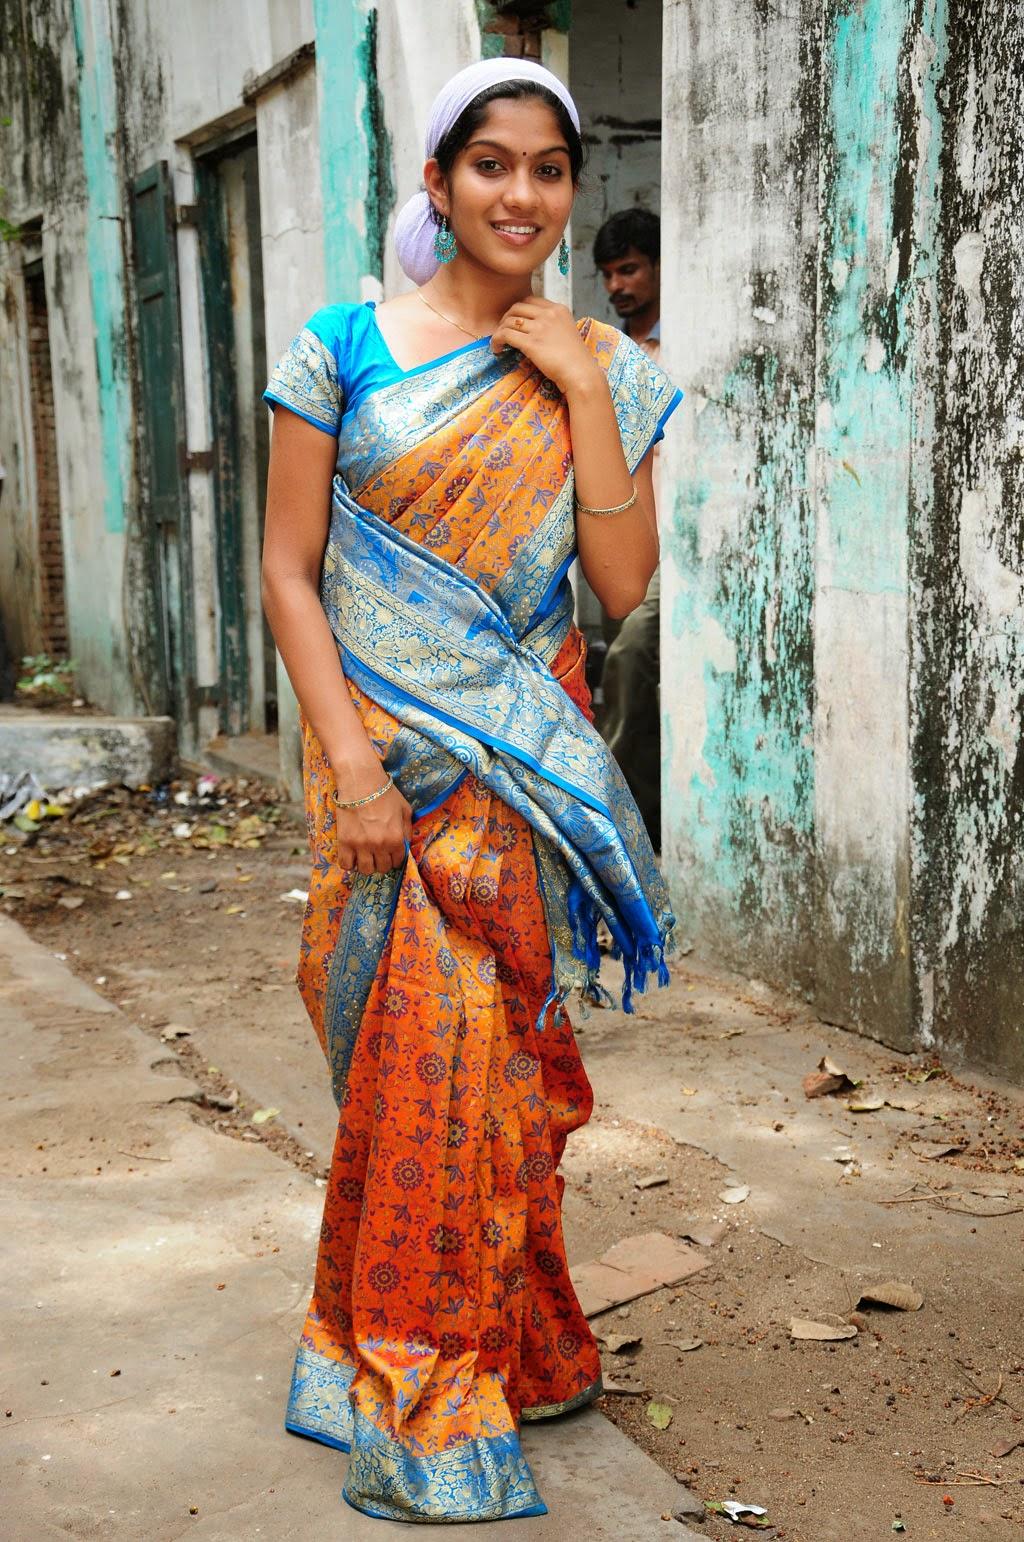 S, Swasika, Swasika Hot Pics, Saree pics, HD Actress Gallery, latest Actress HD Photo Gallery, Latest actress Stills, Tamil Actress, Tamil Actress photo Gallery, Indian Actress, Actress HD Photo Gallery, Swasika tamil movie actress hot saree photo stills